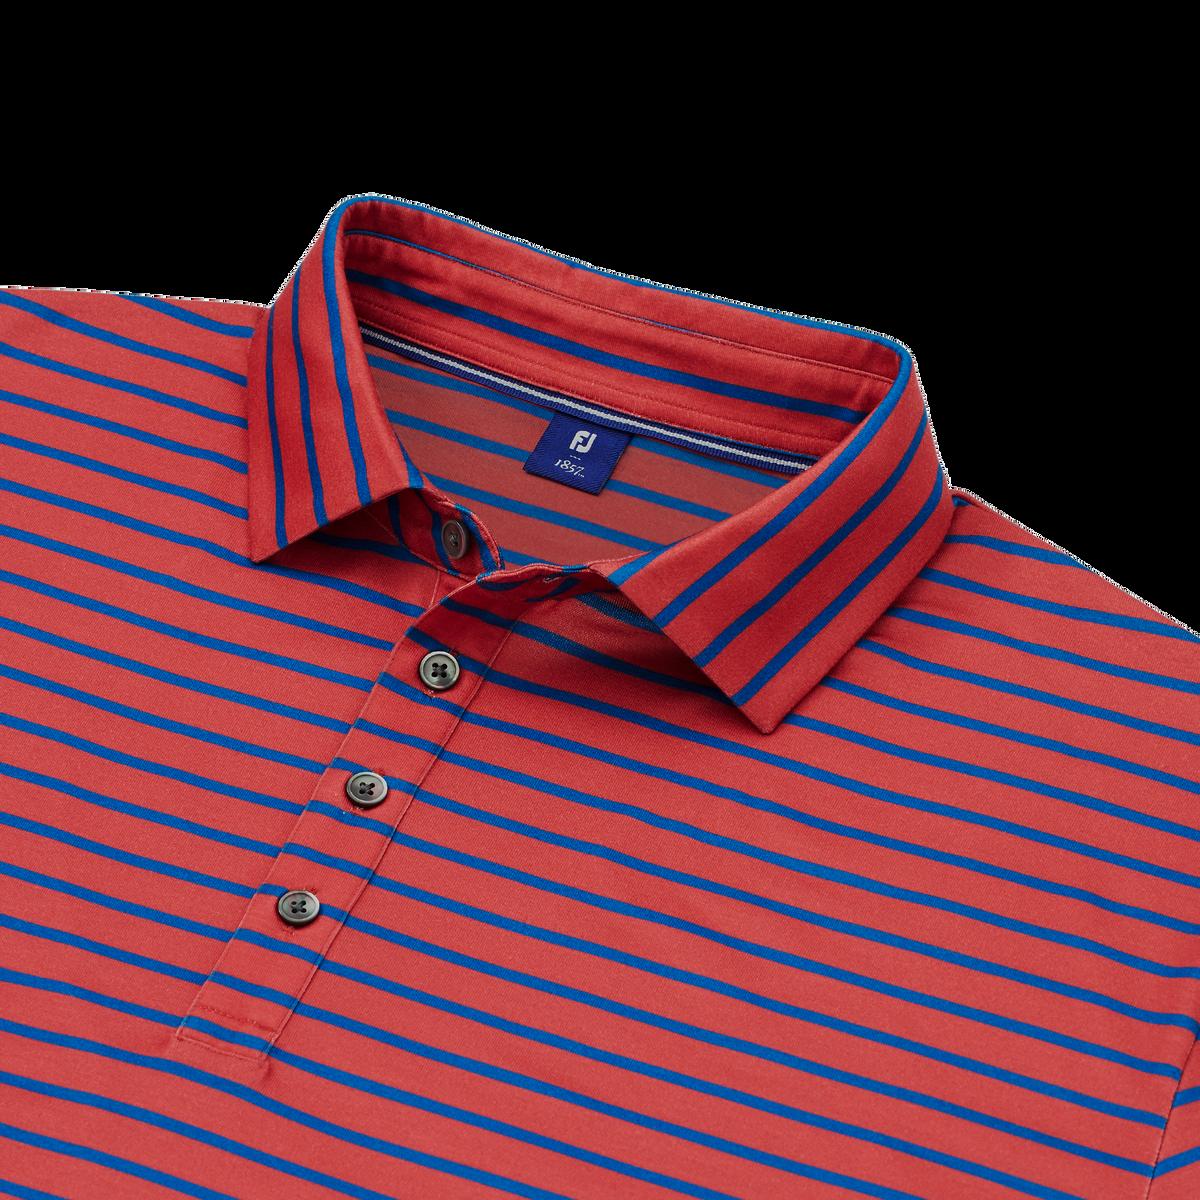 Pima Lisle Stripe Spread Collar